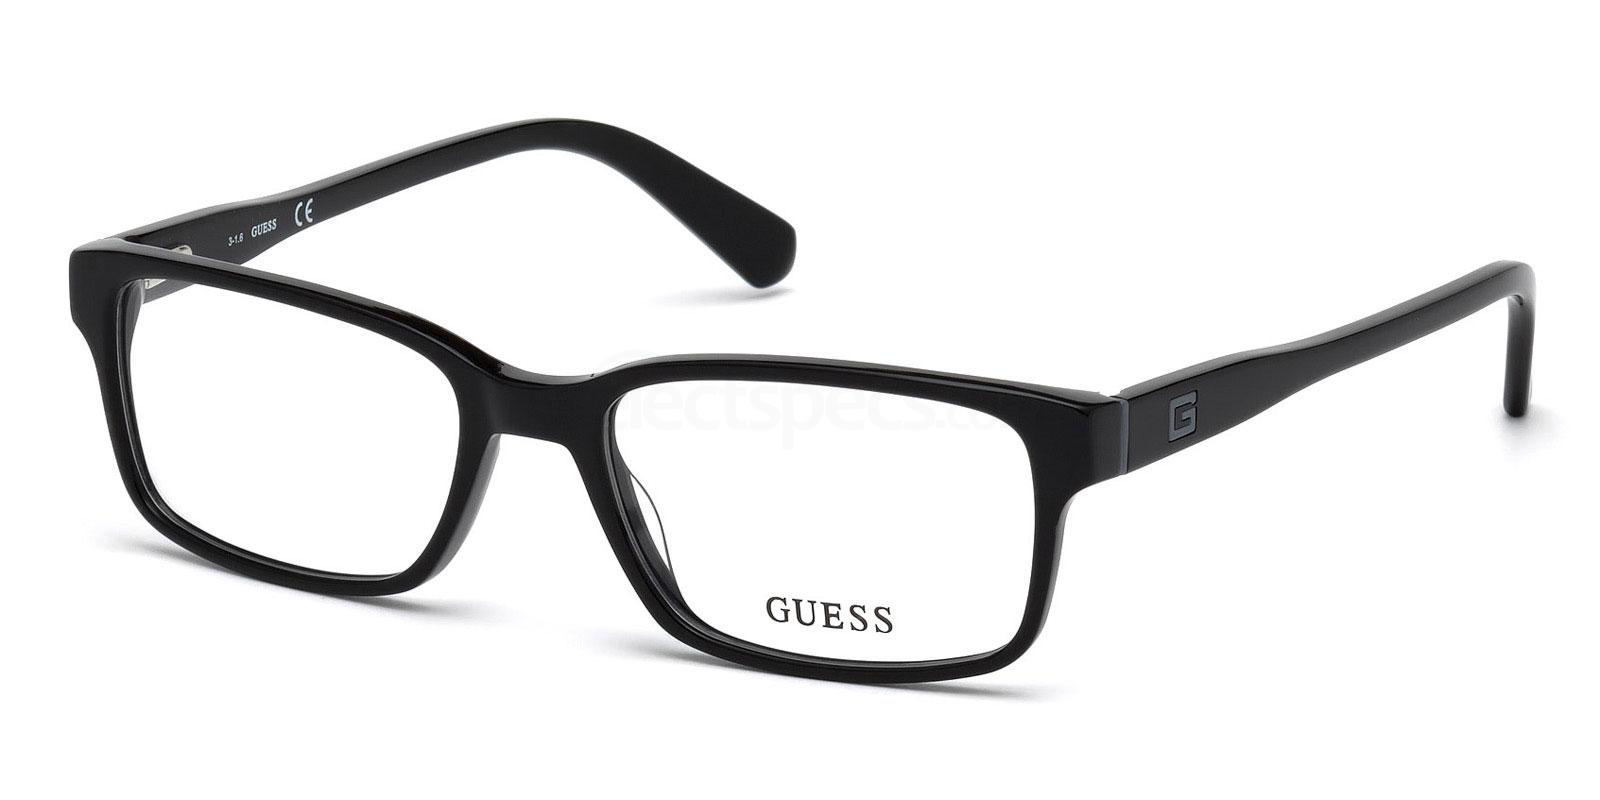 001 GU1906 Glasses, Guess